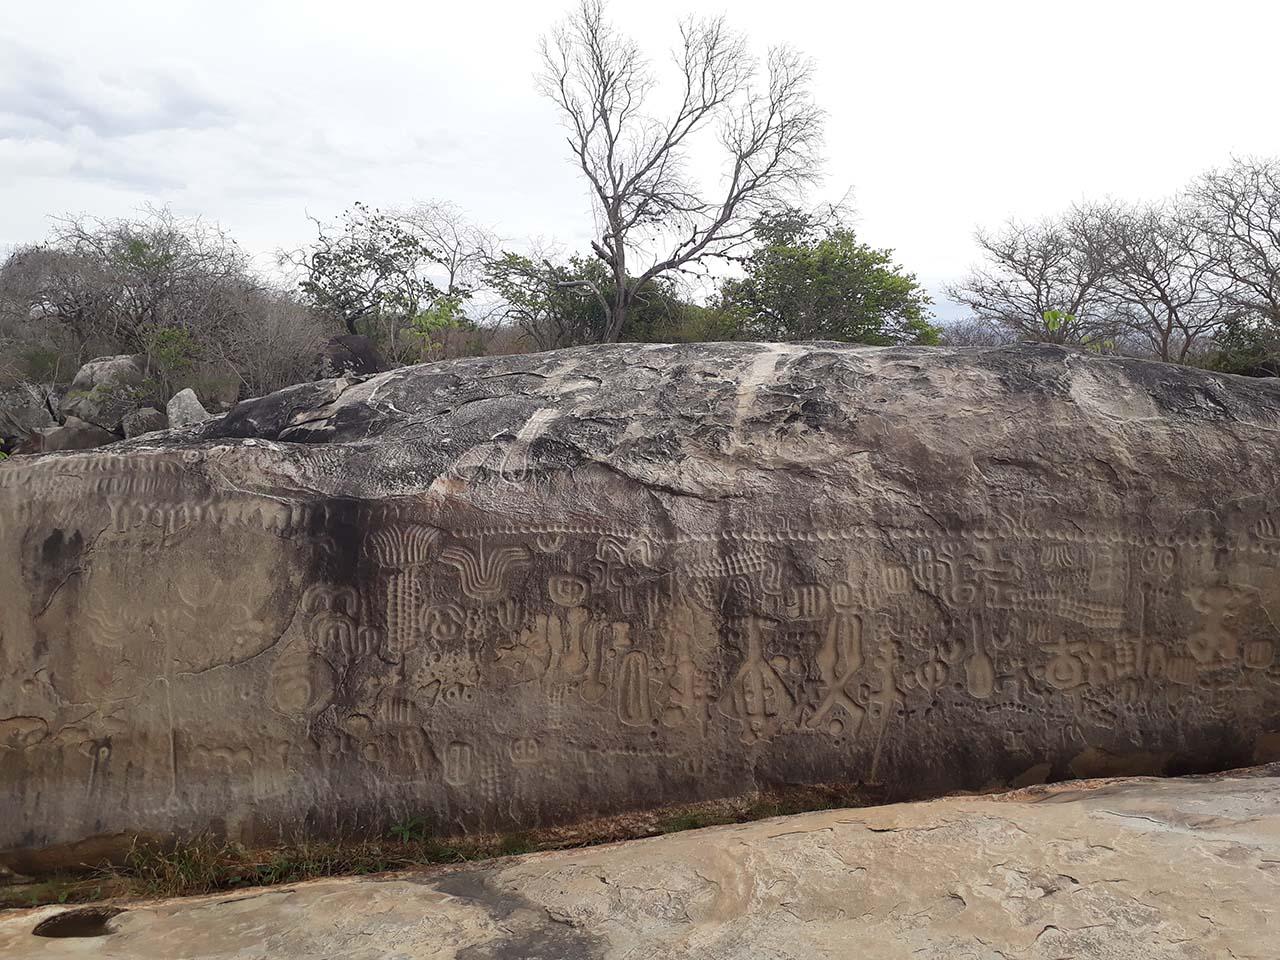 Pedra do Inga